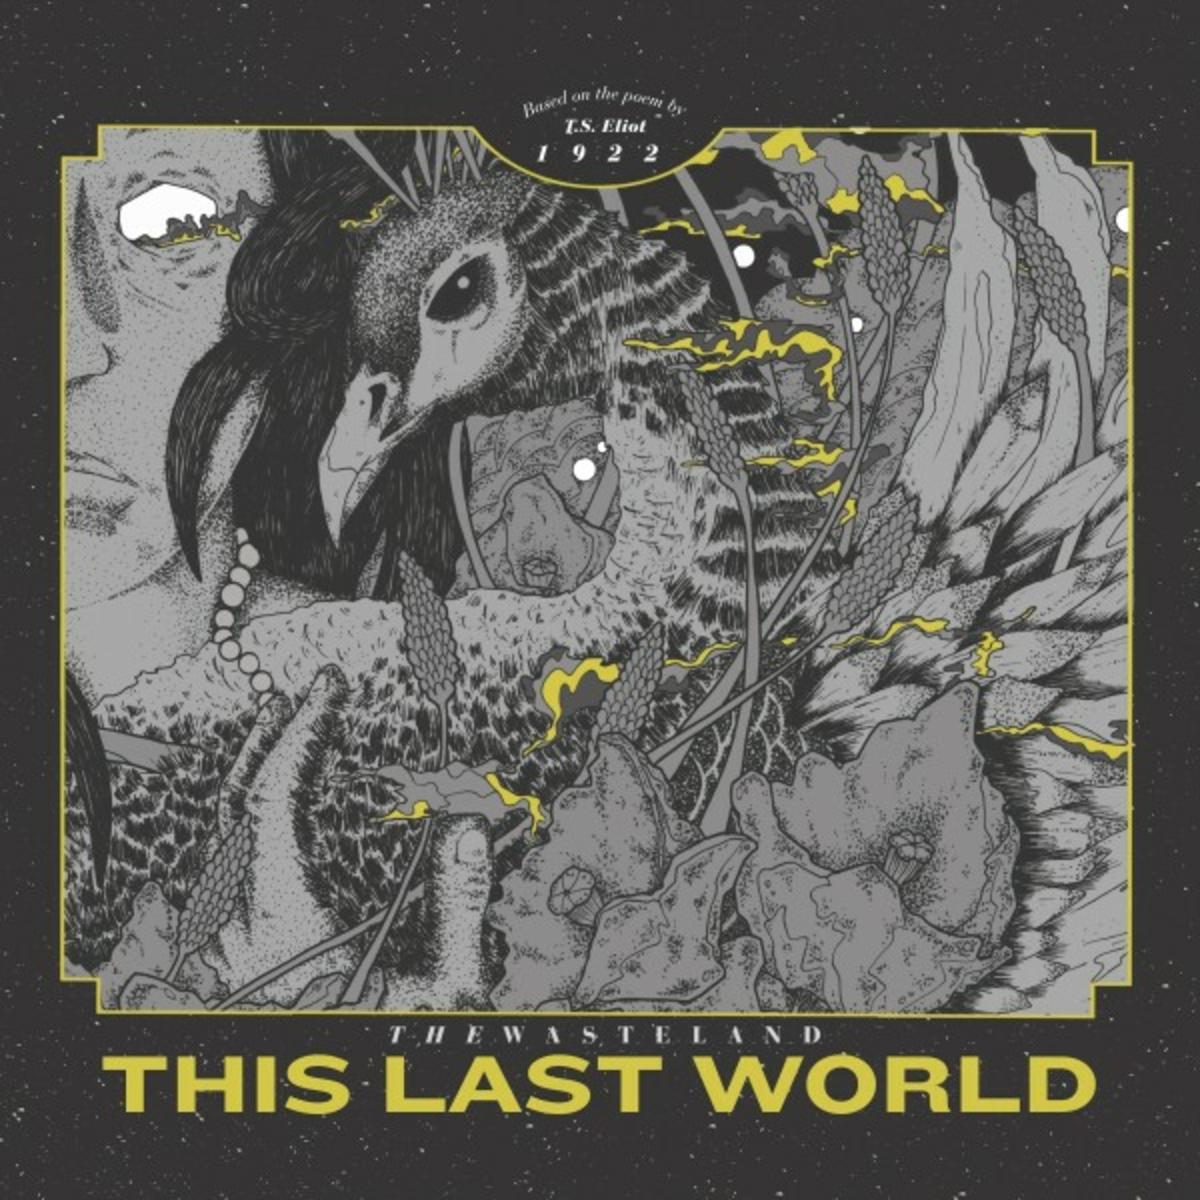 This Last World - The Wasteland (2019)